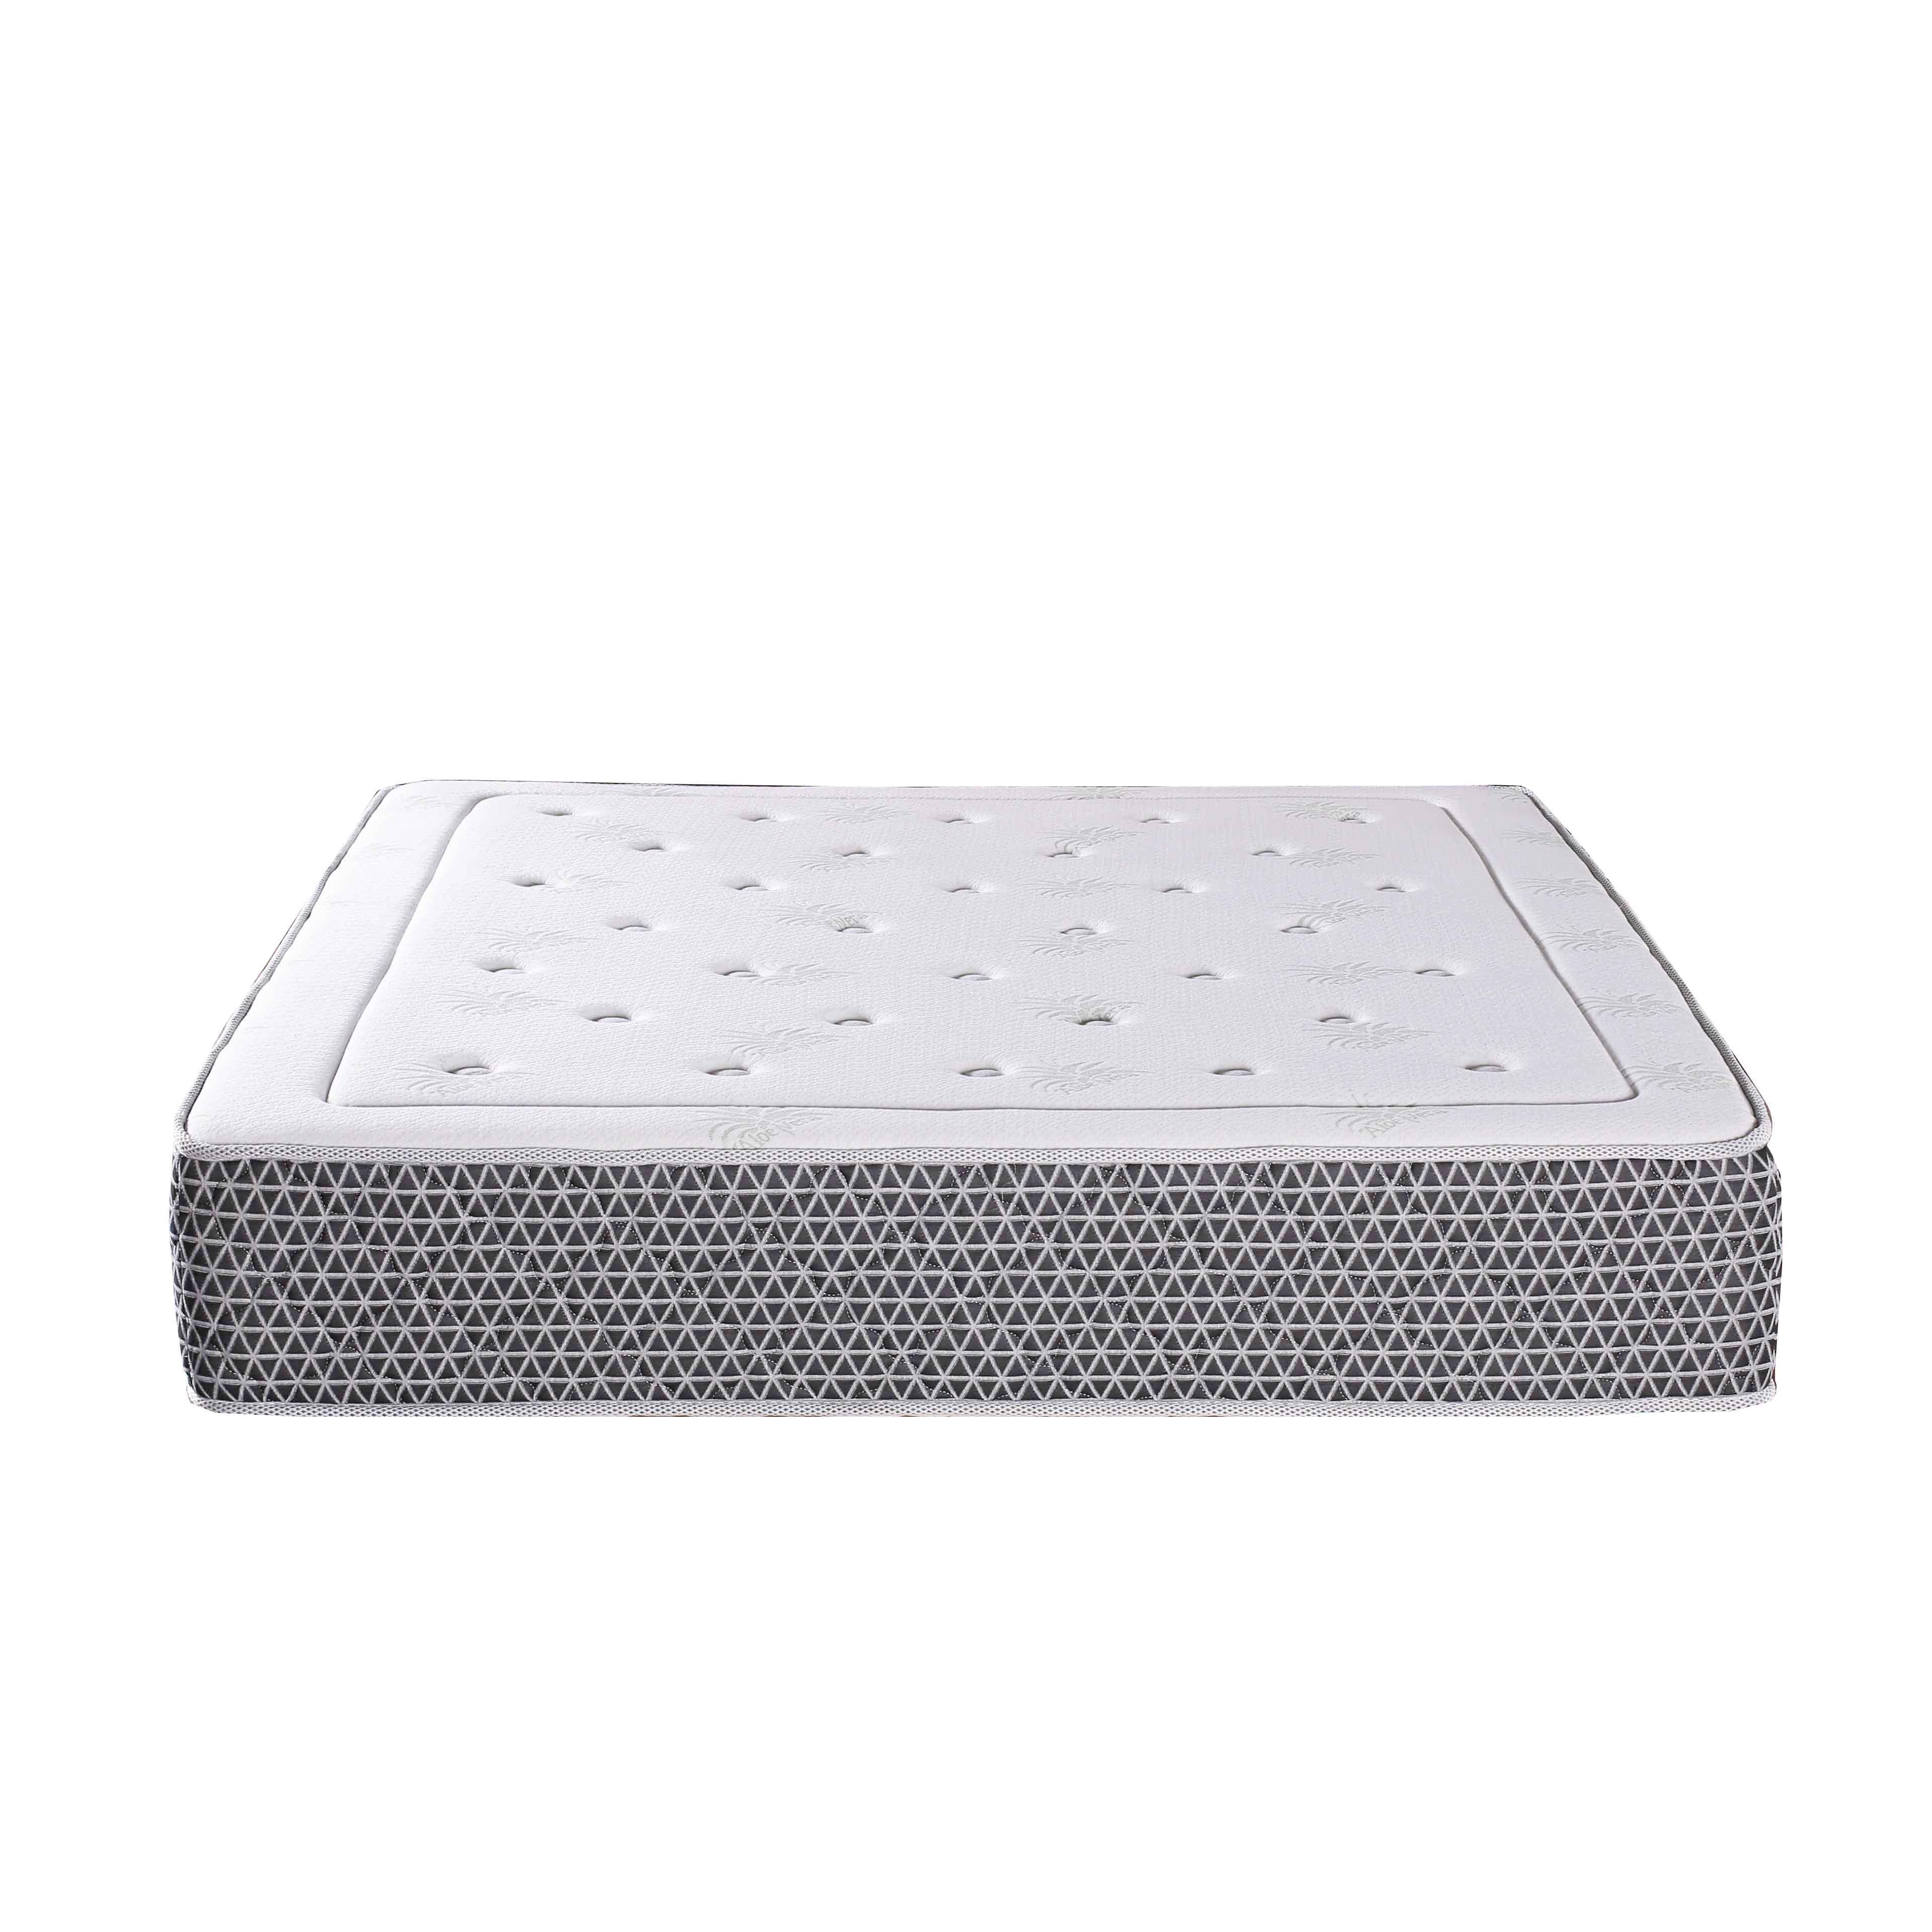 Alibaba Trade Assurance supplier High density foam pocket spring hybrid mattress 10% OFF hot sale now - Jozy Mattress | Jozy.net